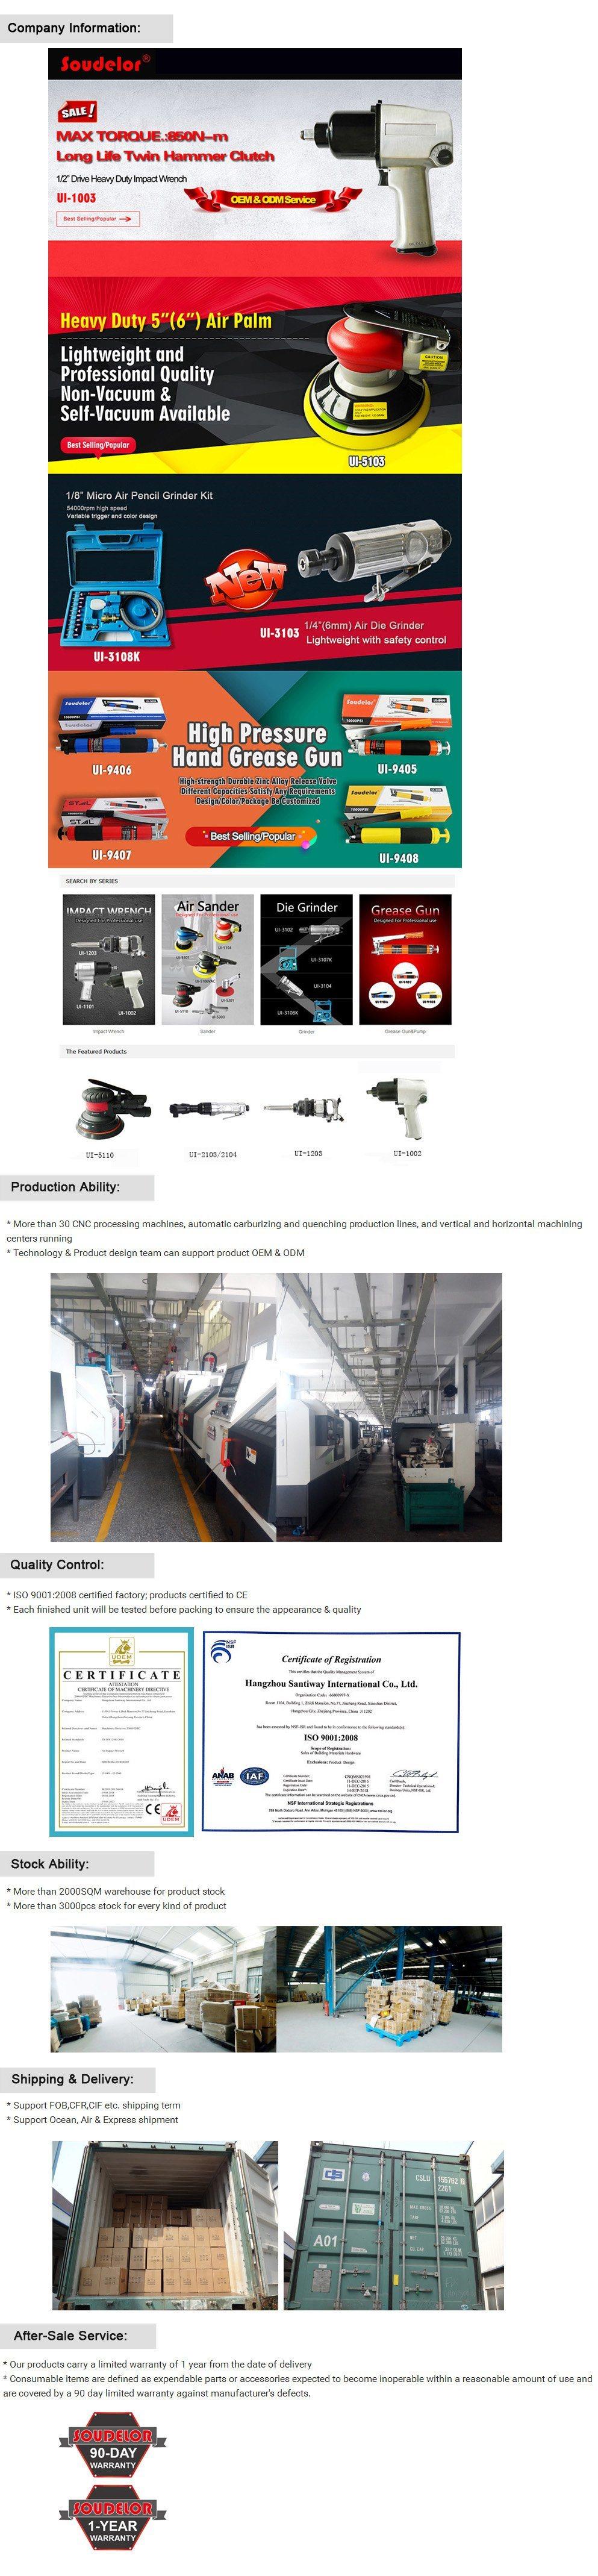 125mm (152mm) Pad Aluminum Auto Body Sanding Air Orbital Sander